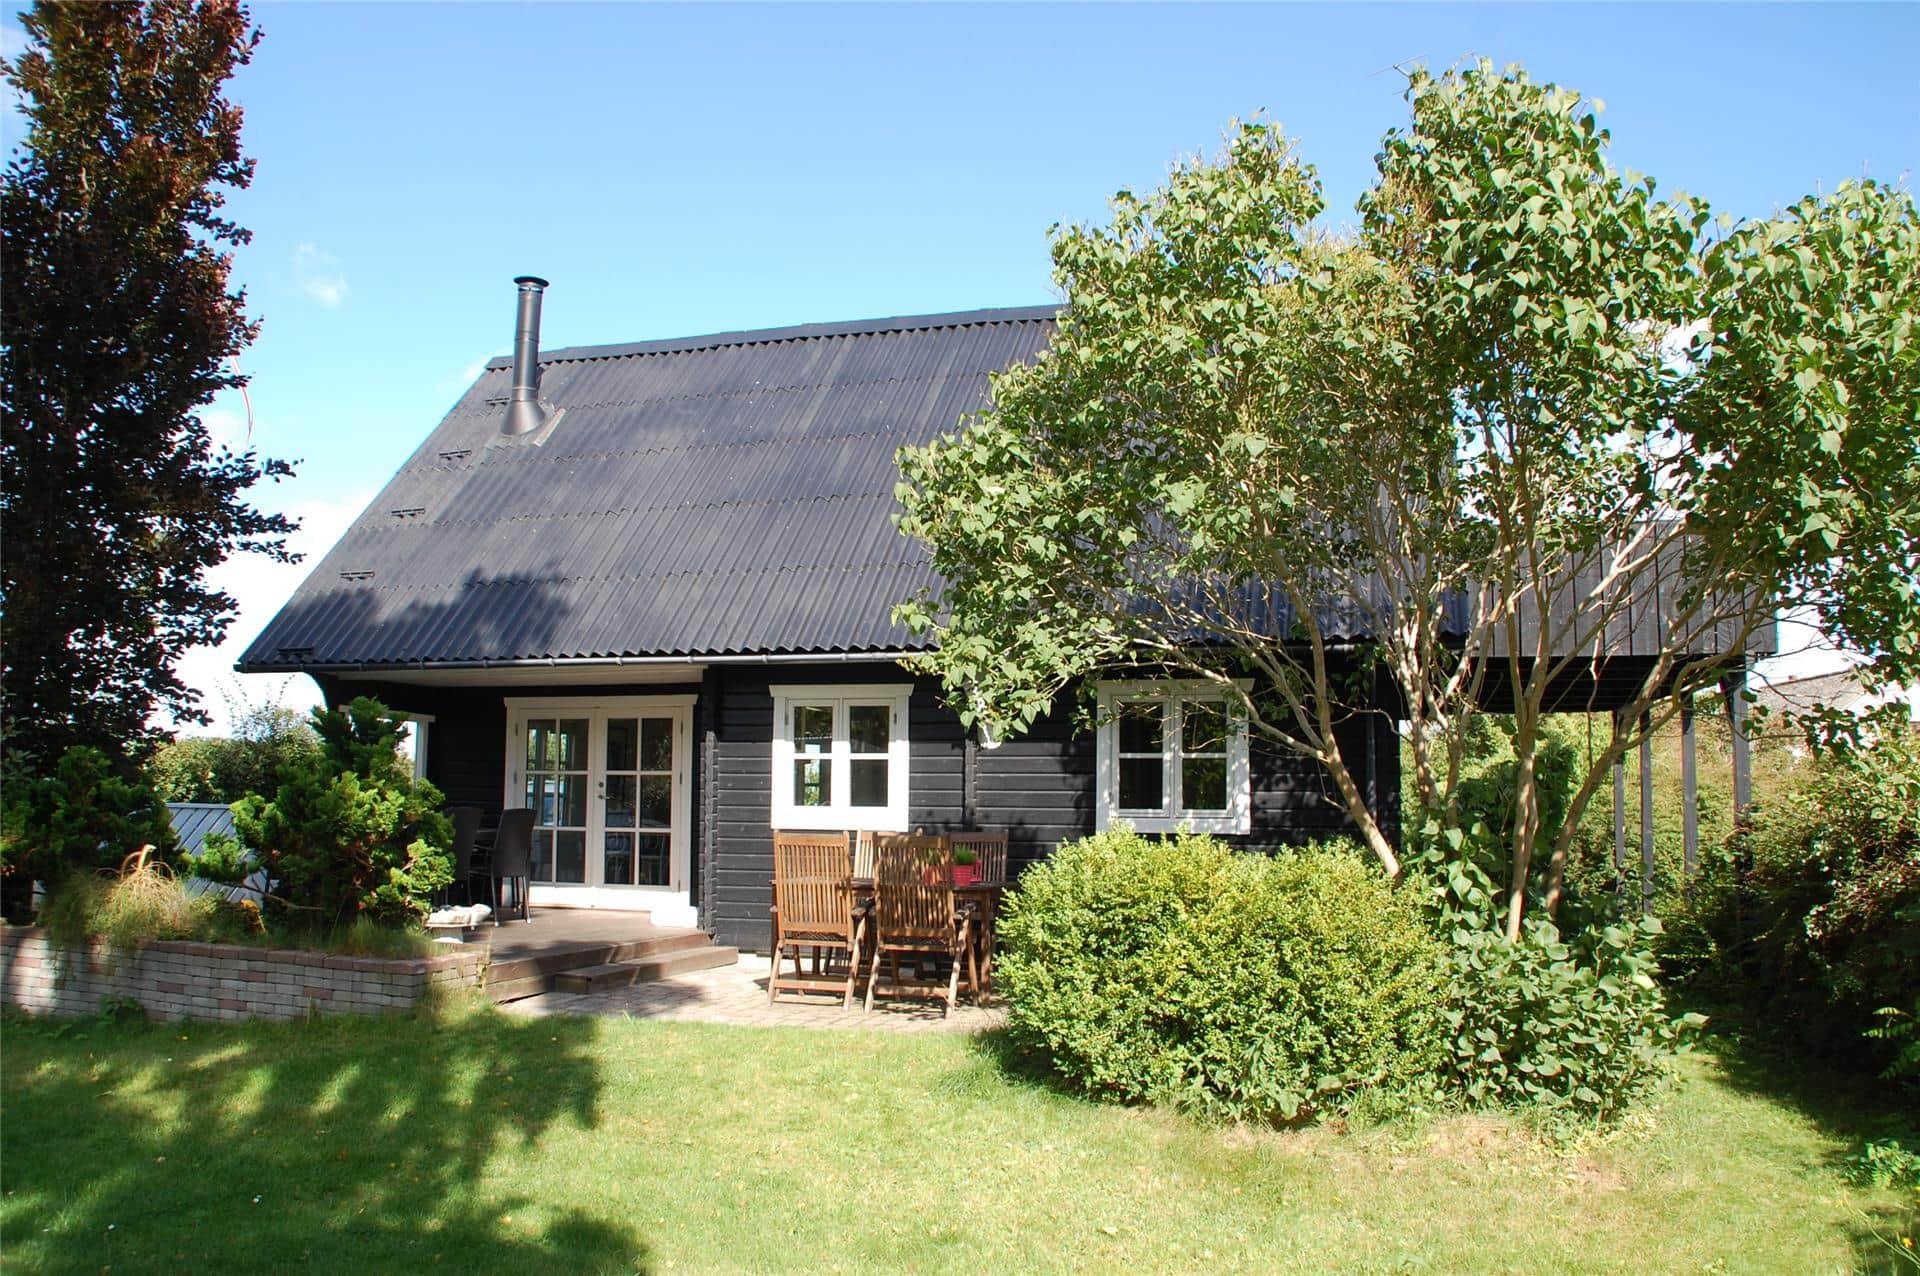 Billede 1-3 Sommerhus M65288, Strandbakken 33, DK - 5631 Ebberup